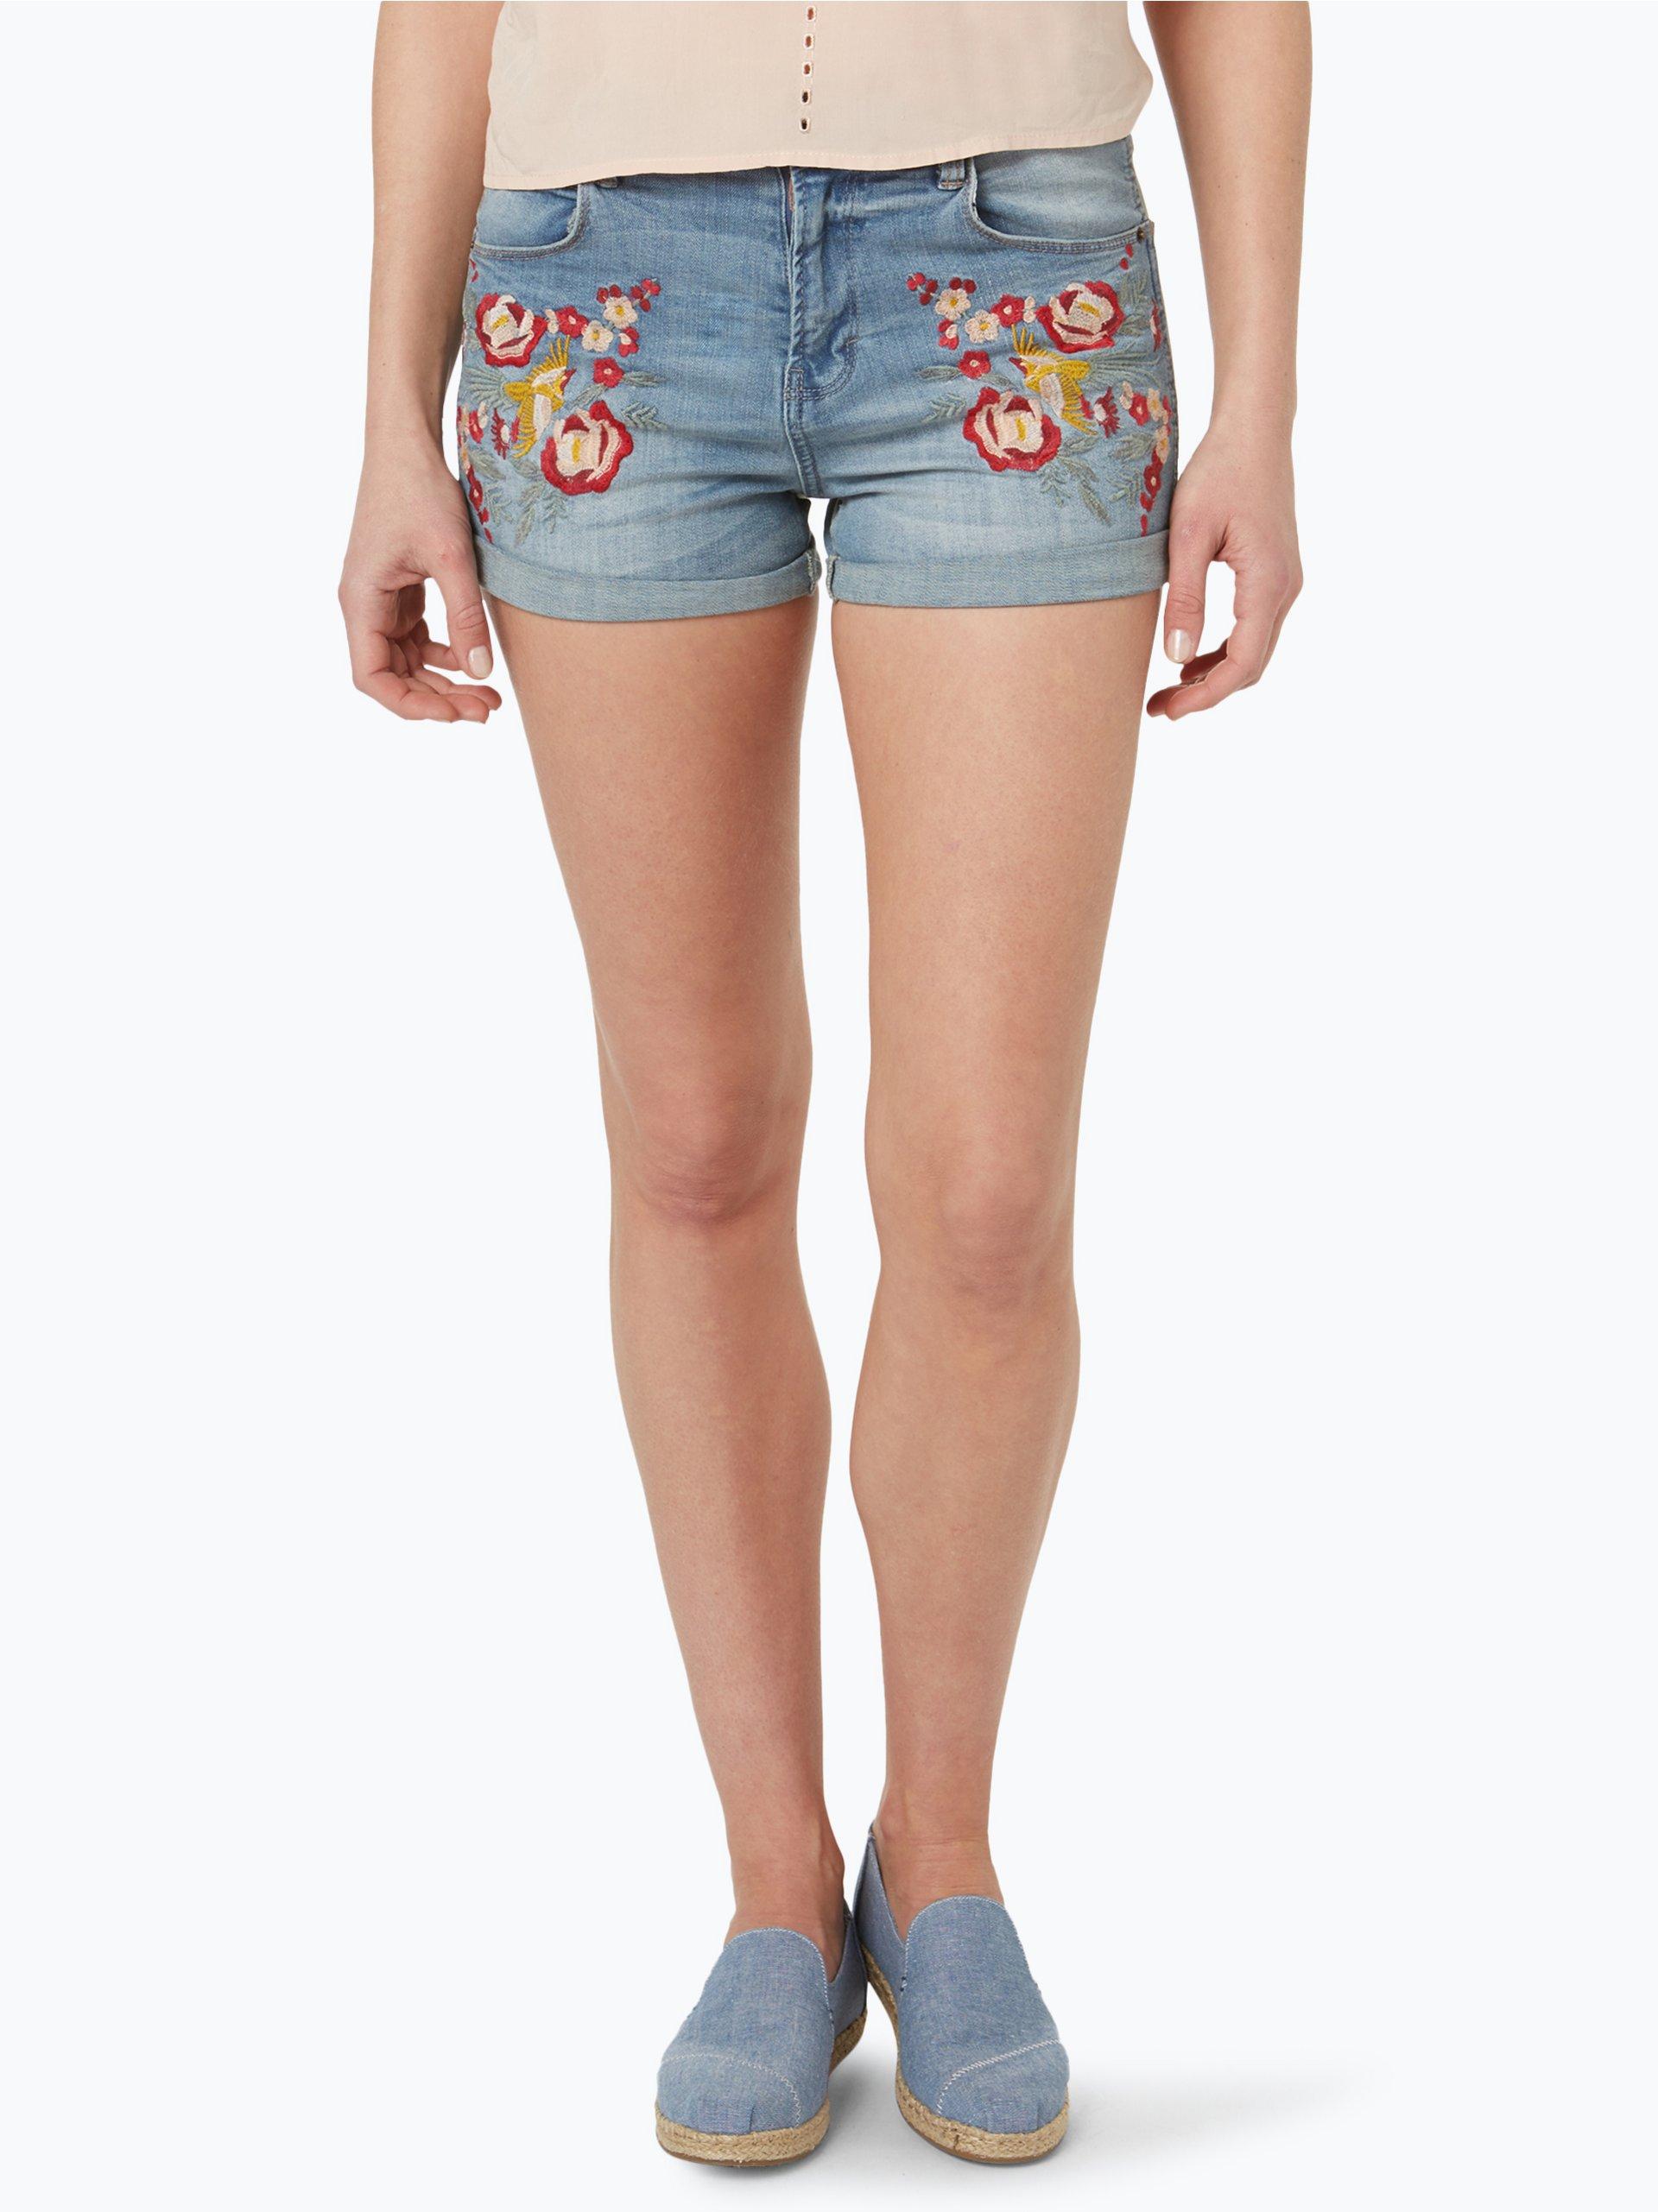 review damen jeans shorts 2 online kaufen peek und cloppenburg de. Black Bedroom Furniture Sets. Home Design Ideas